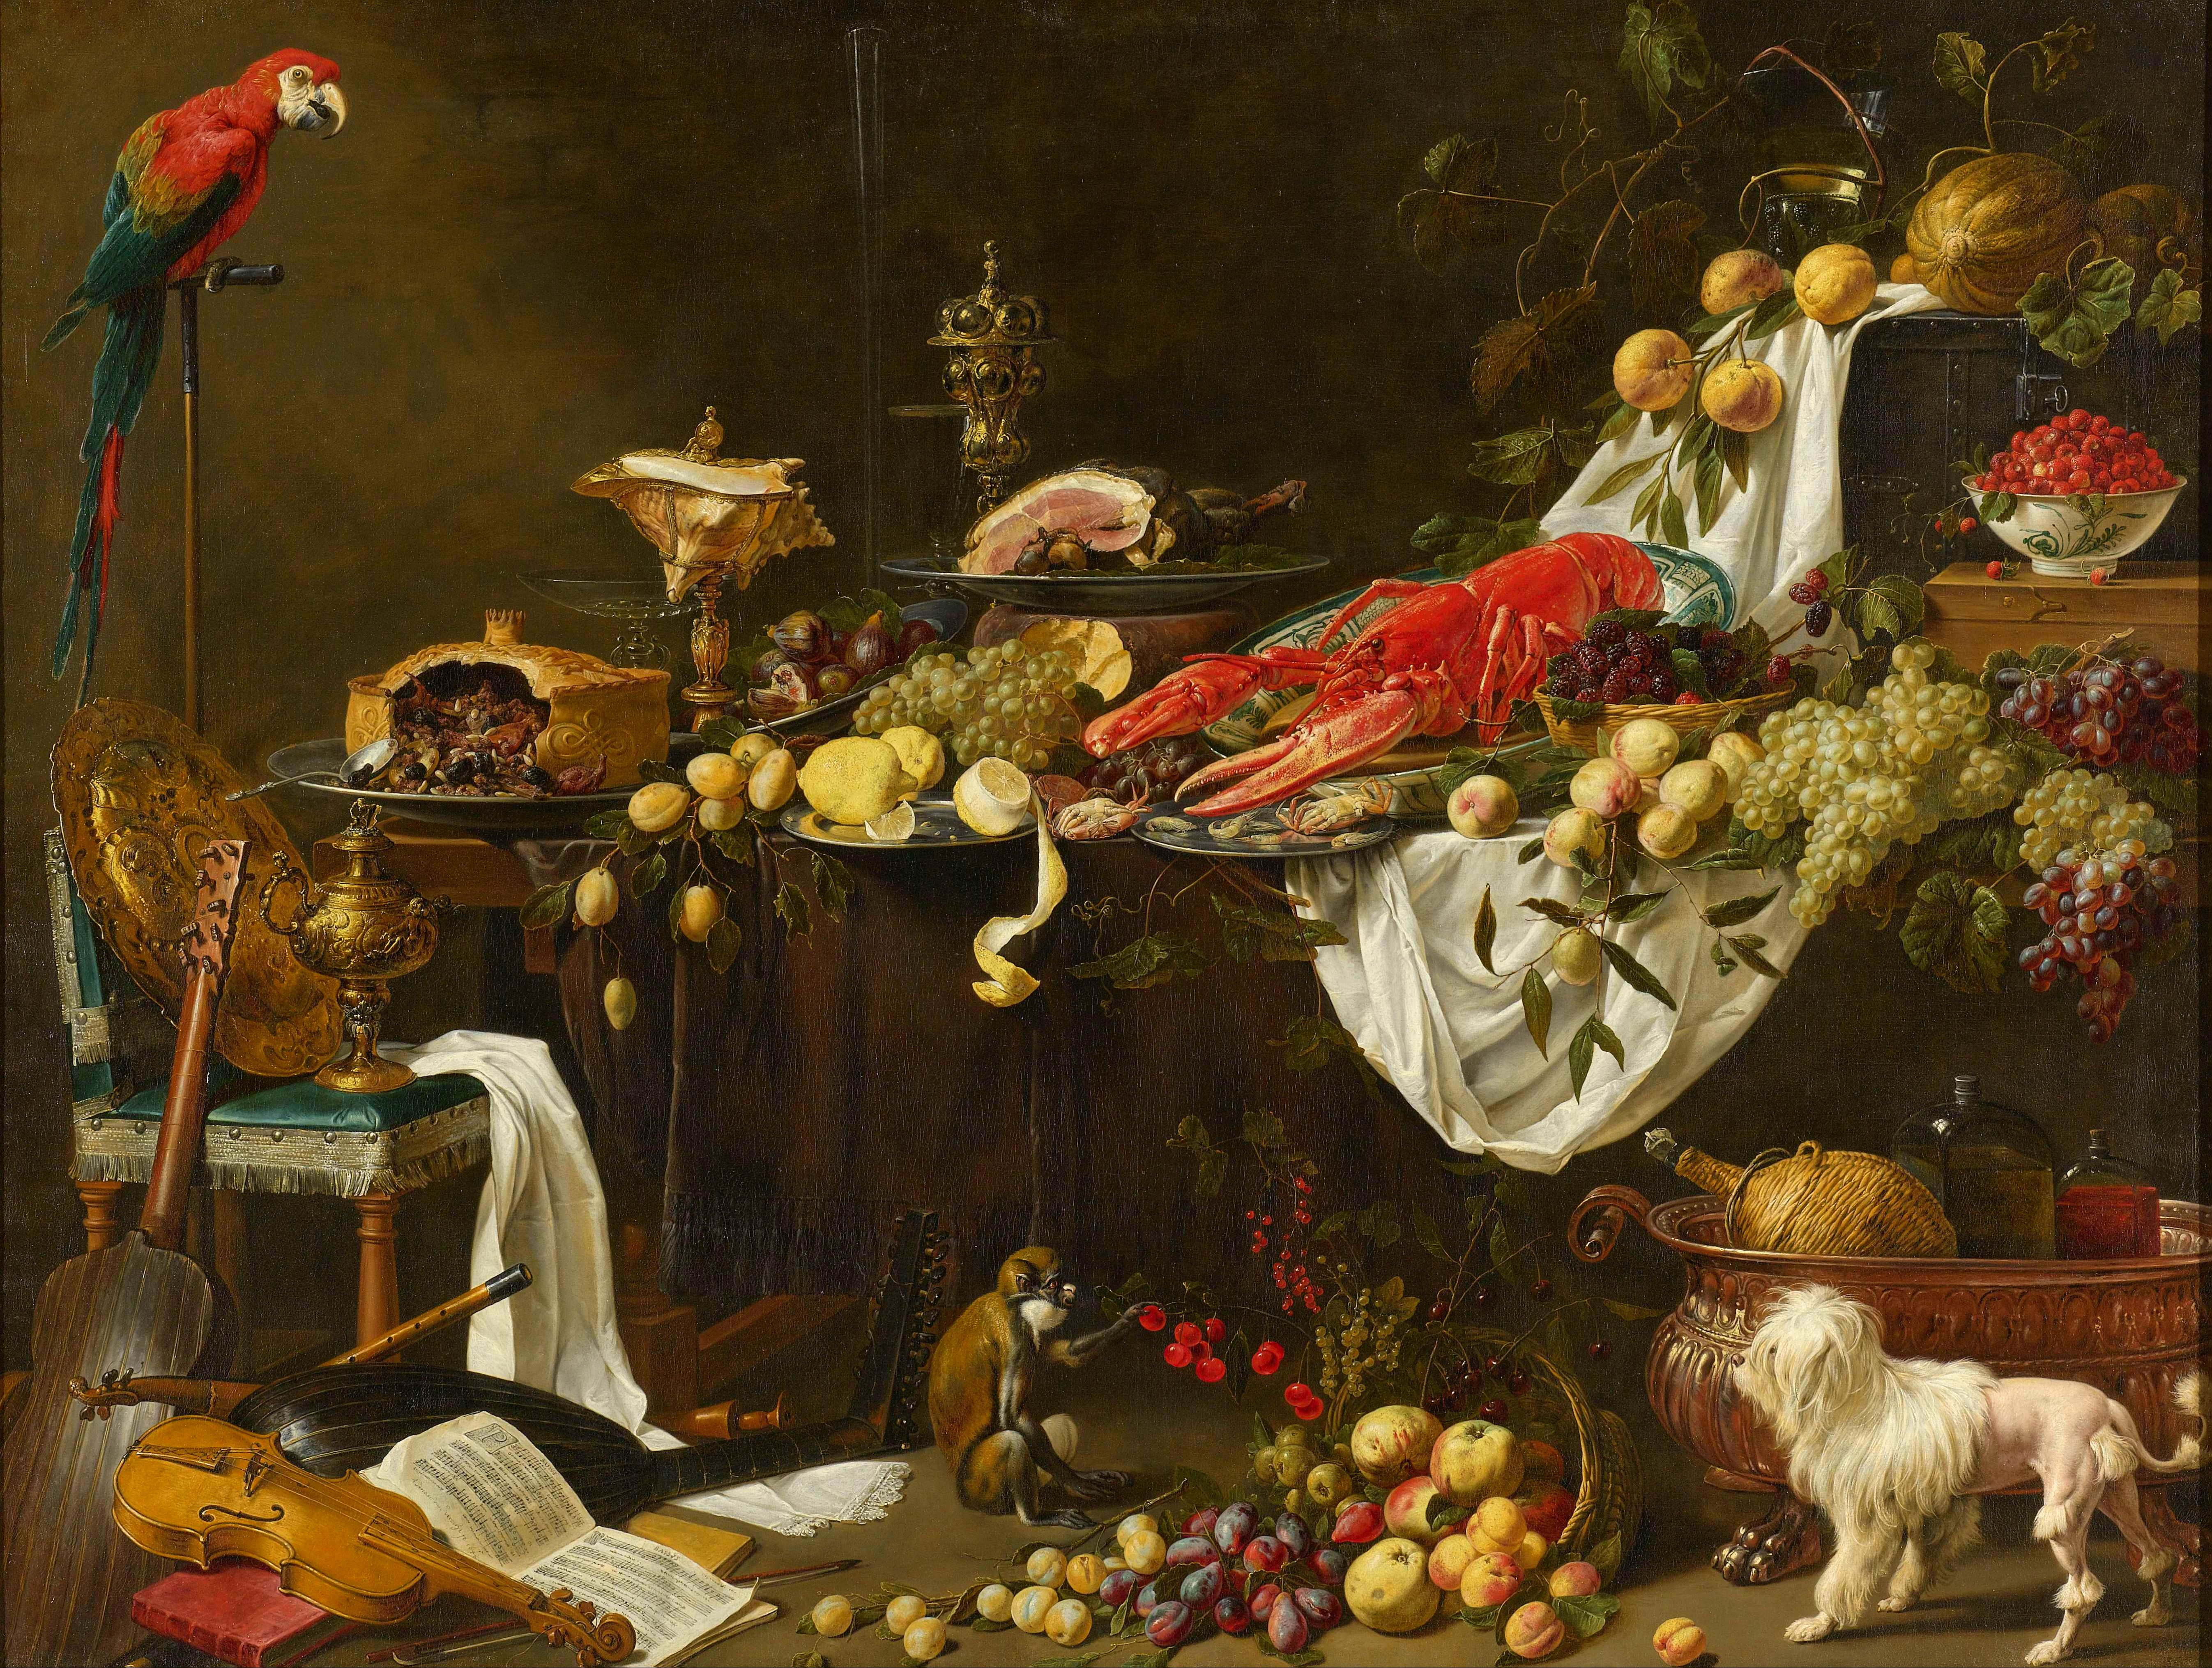 Banquet_Still_Life,_Adriaen_van_Utrecht,_1644_-_Rijksmuseum-1.jpg